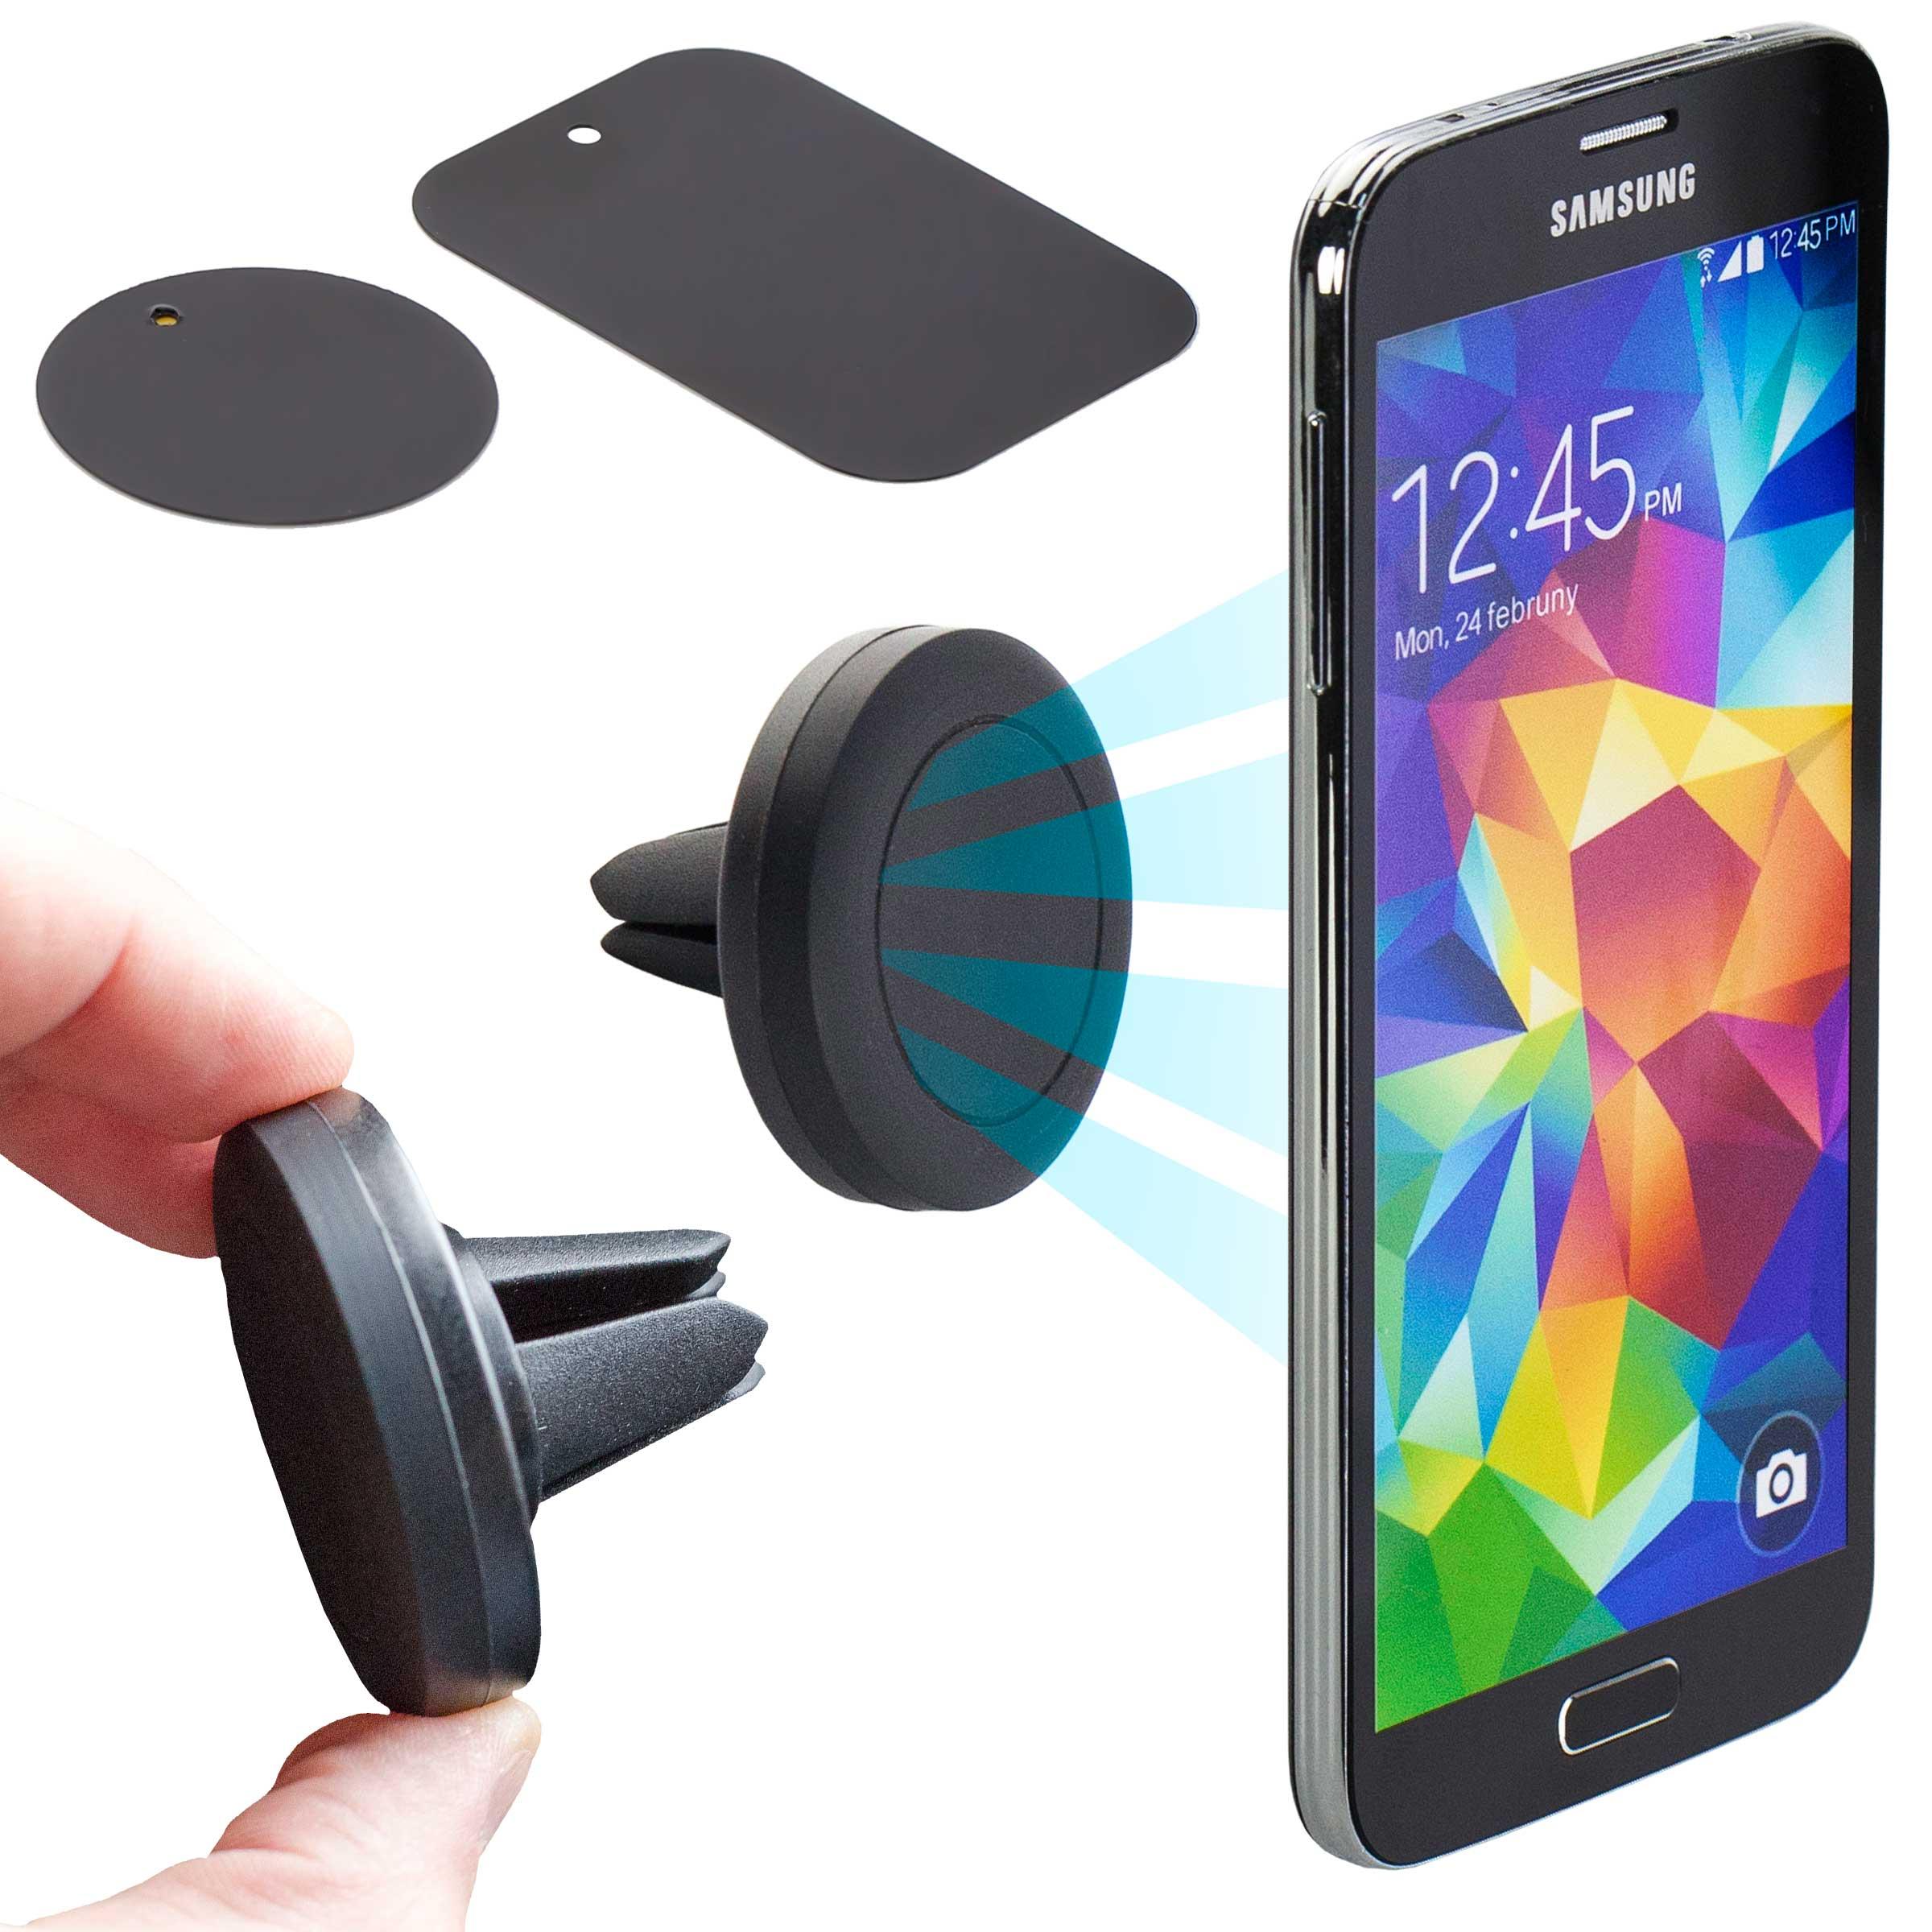 2x kfz l fter magnet halterung l ftung auto halter for Minimalistisches smartphone